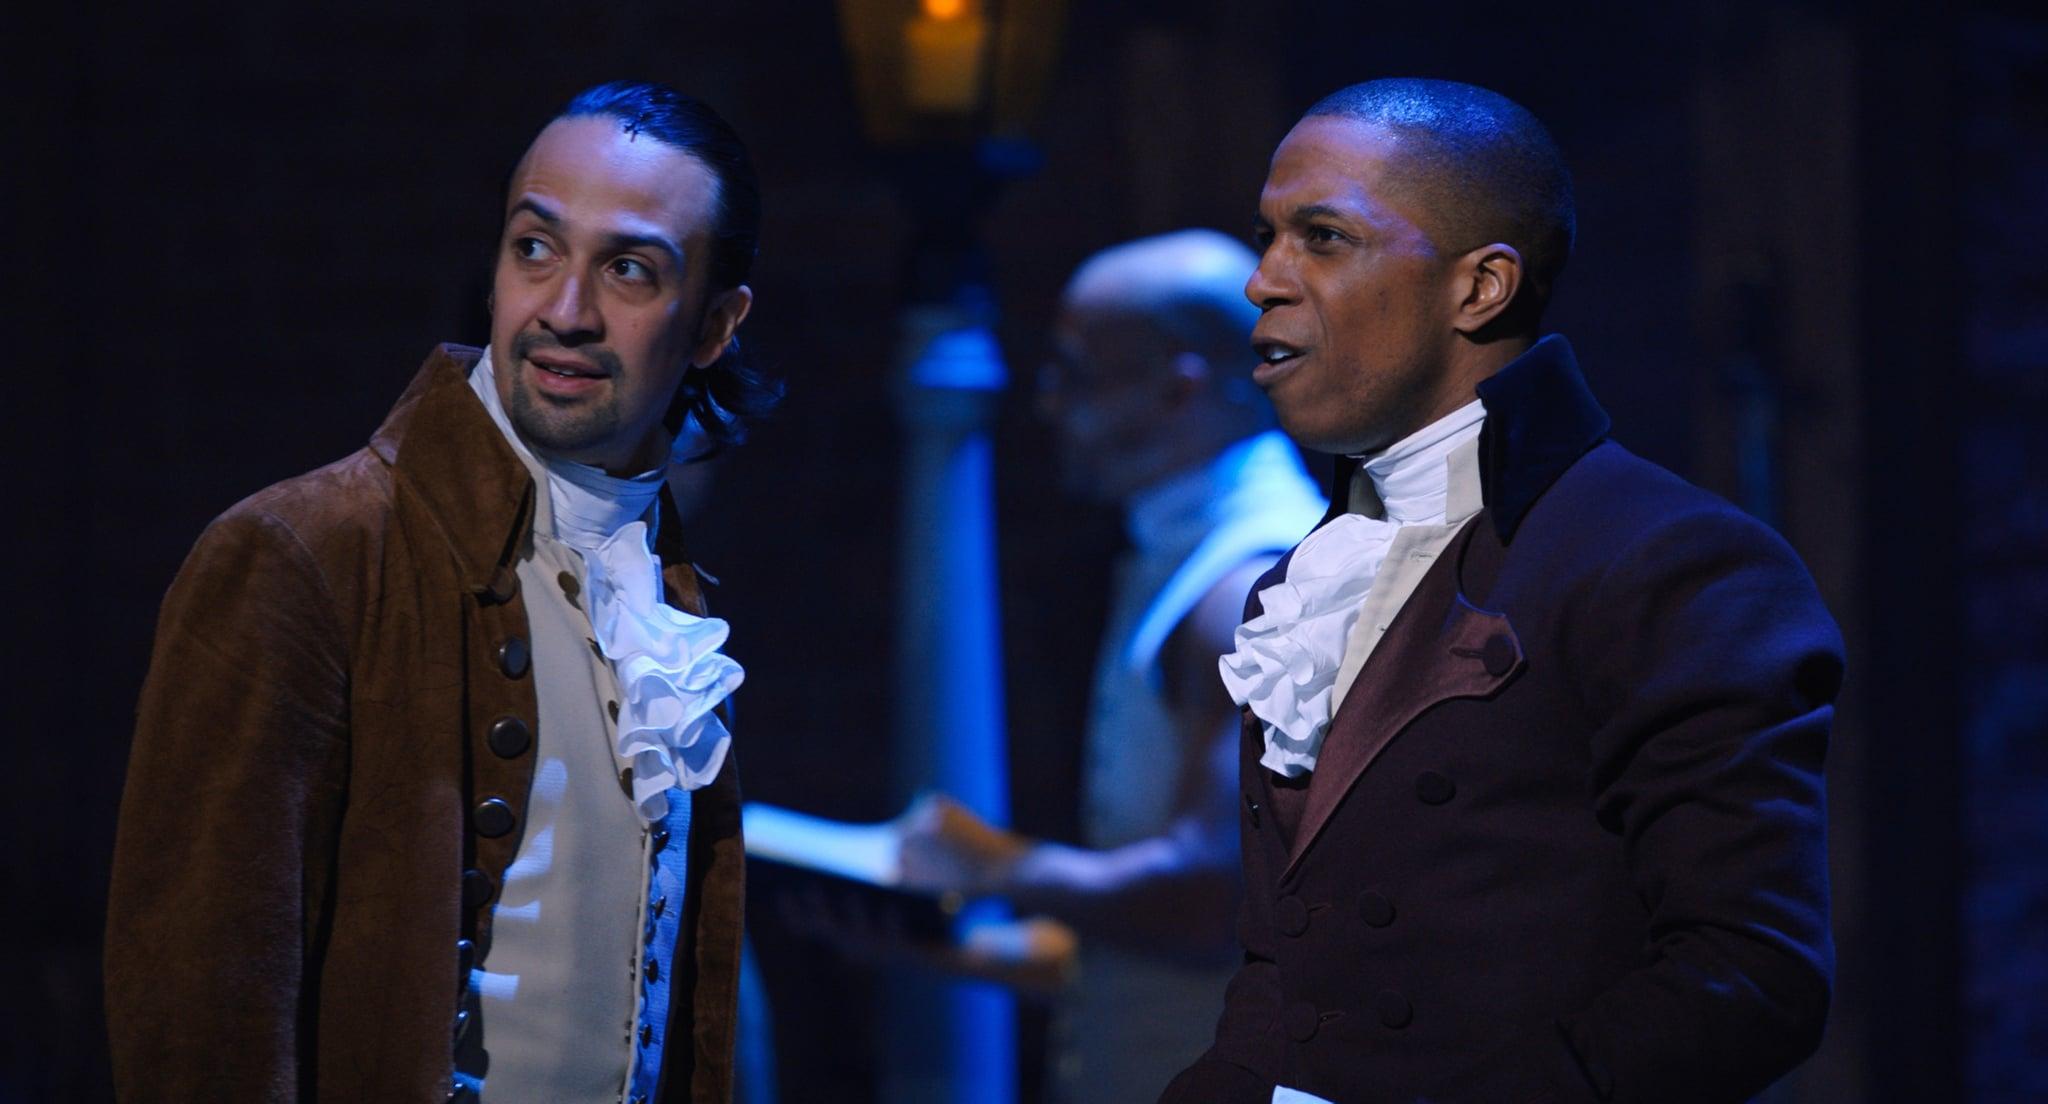 HAMILTON, from left: Lin-Manuel Miranda as Alexander Hamilton, Leslie Odom Jr. as Aaron Burr, 2020.  Disney+ / Courtesy Everett Collection